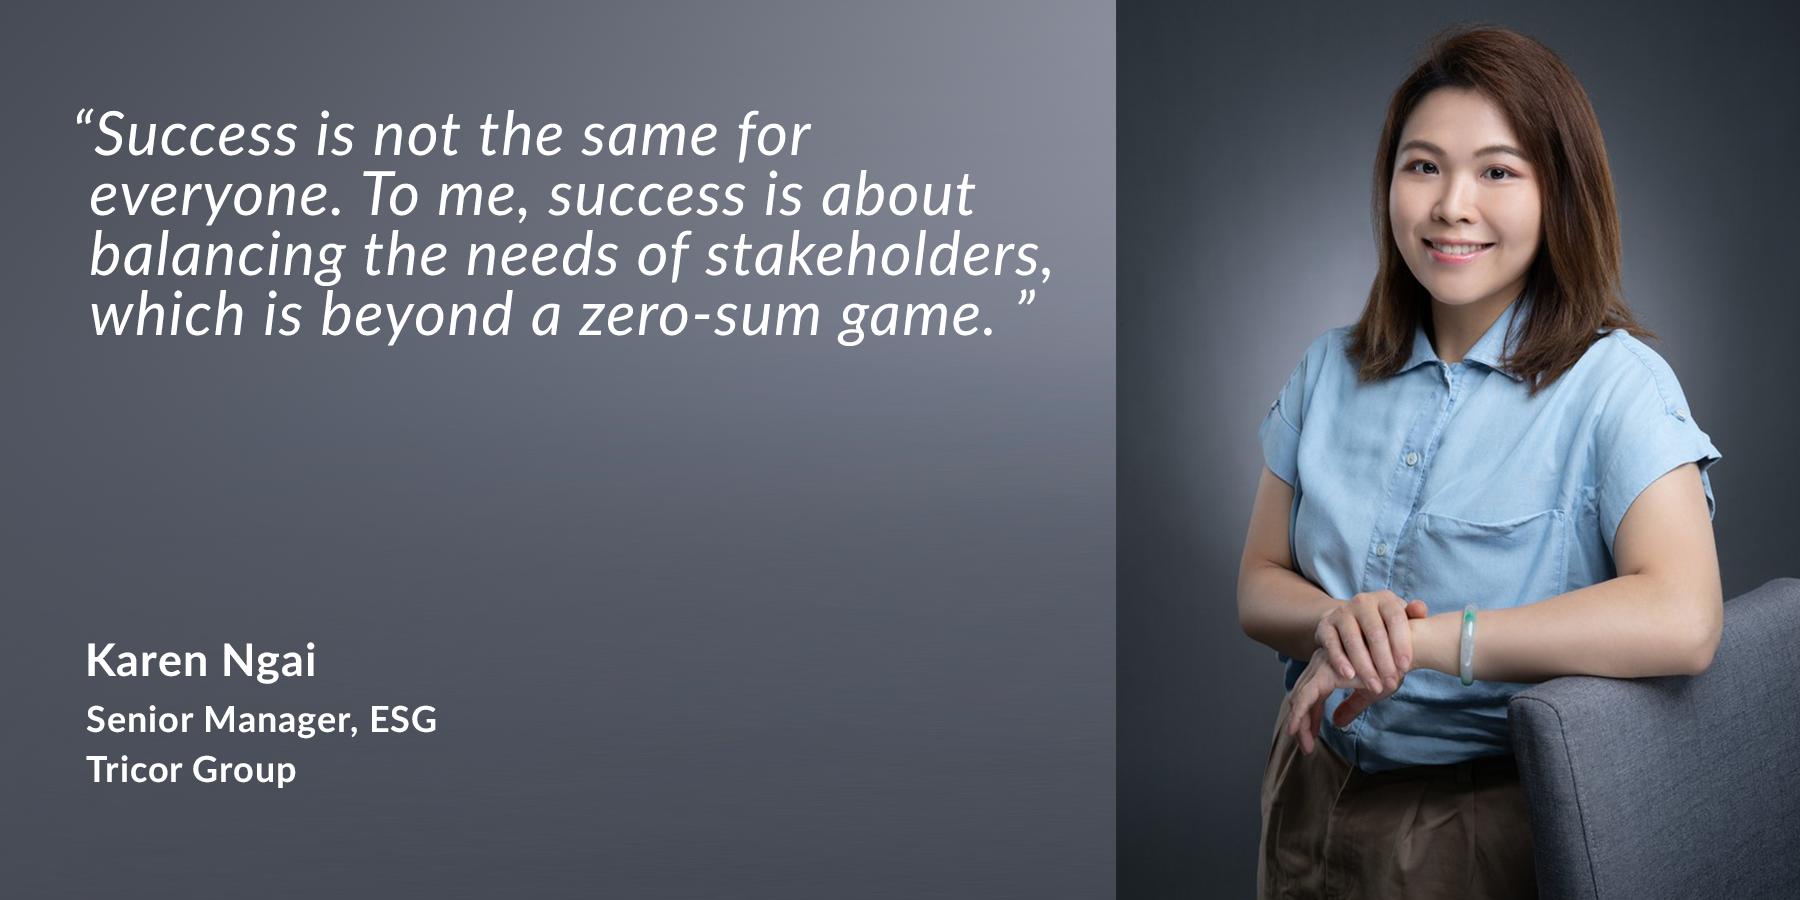 Karen Ngai - Senior Manager, ESG